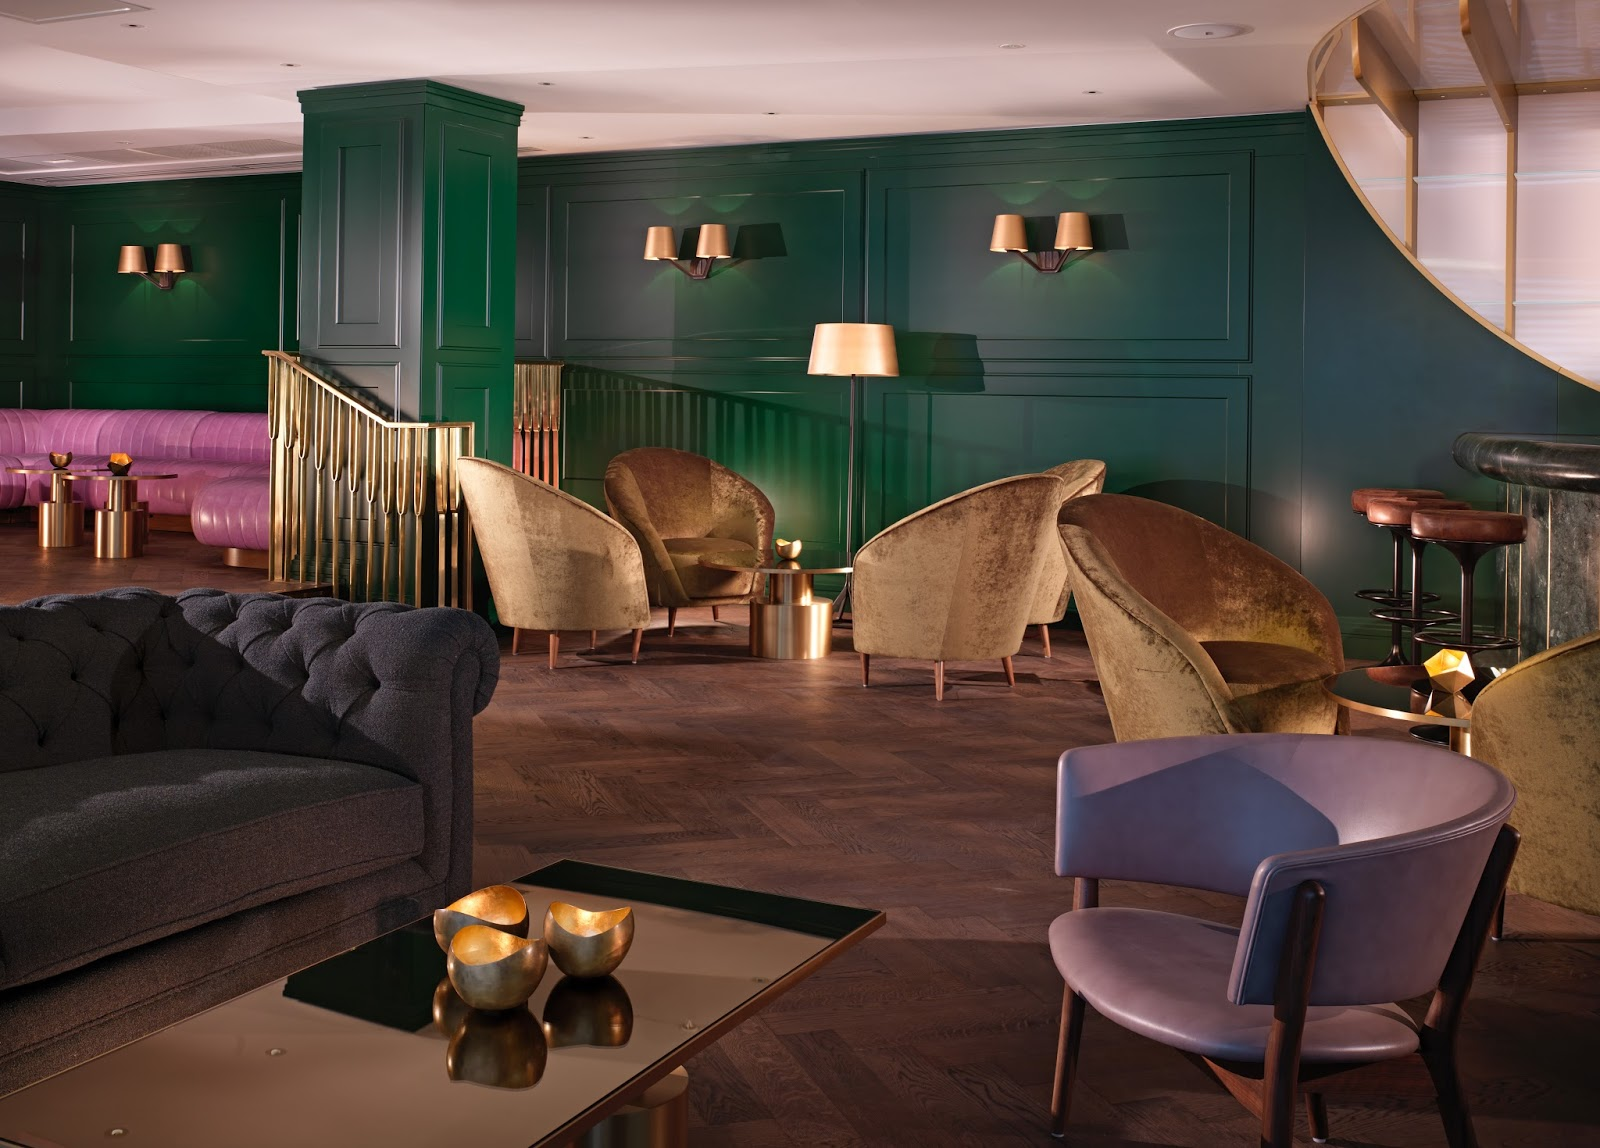 Rumpus Room and Dandelyan @ The Mondrian | OurLDNLife - A London ...